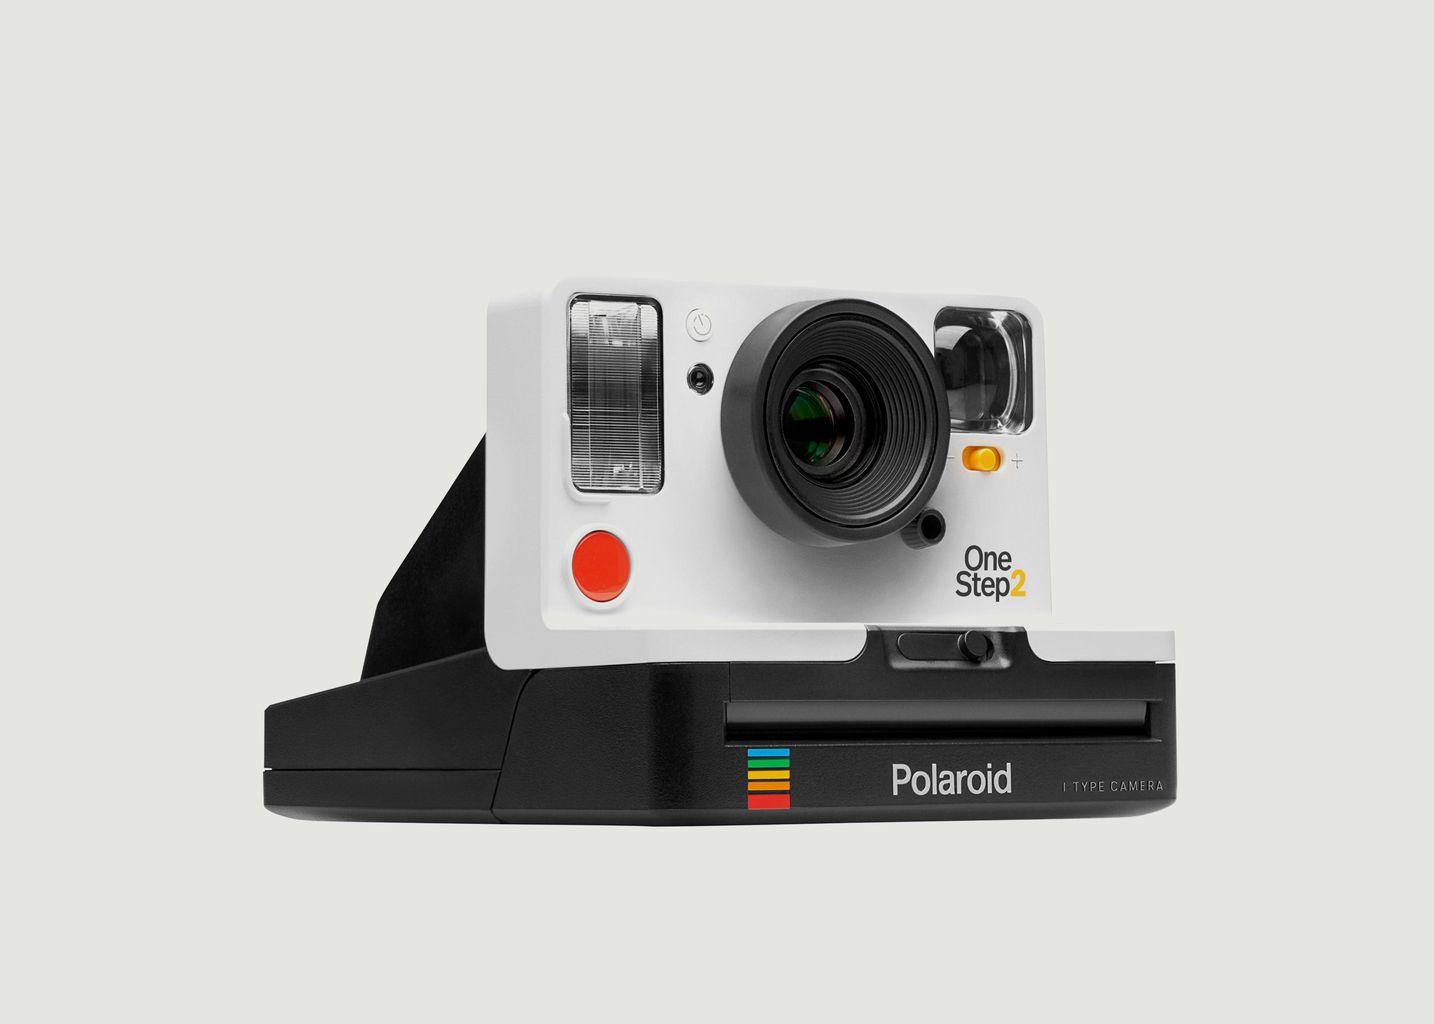 Appareil OneStep2 Viseur i-Type Caméra - Polaroid Originals